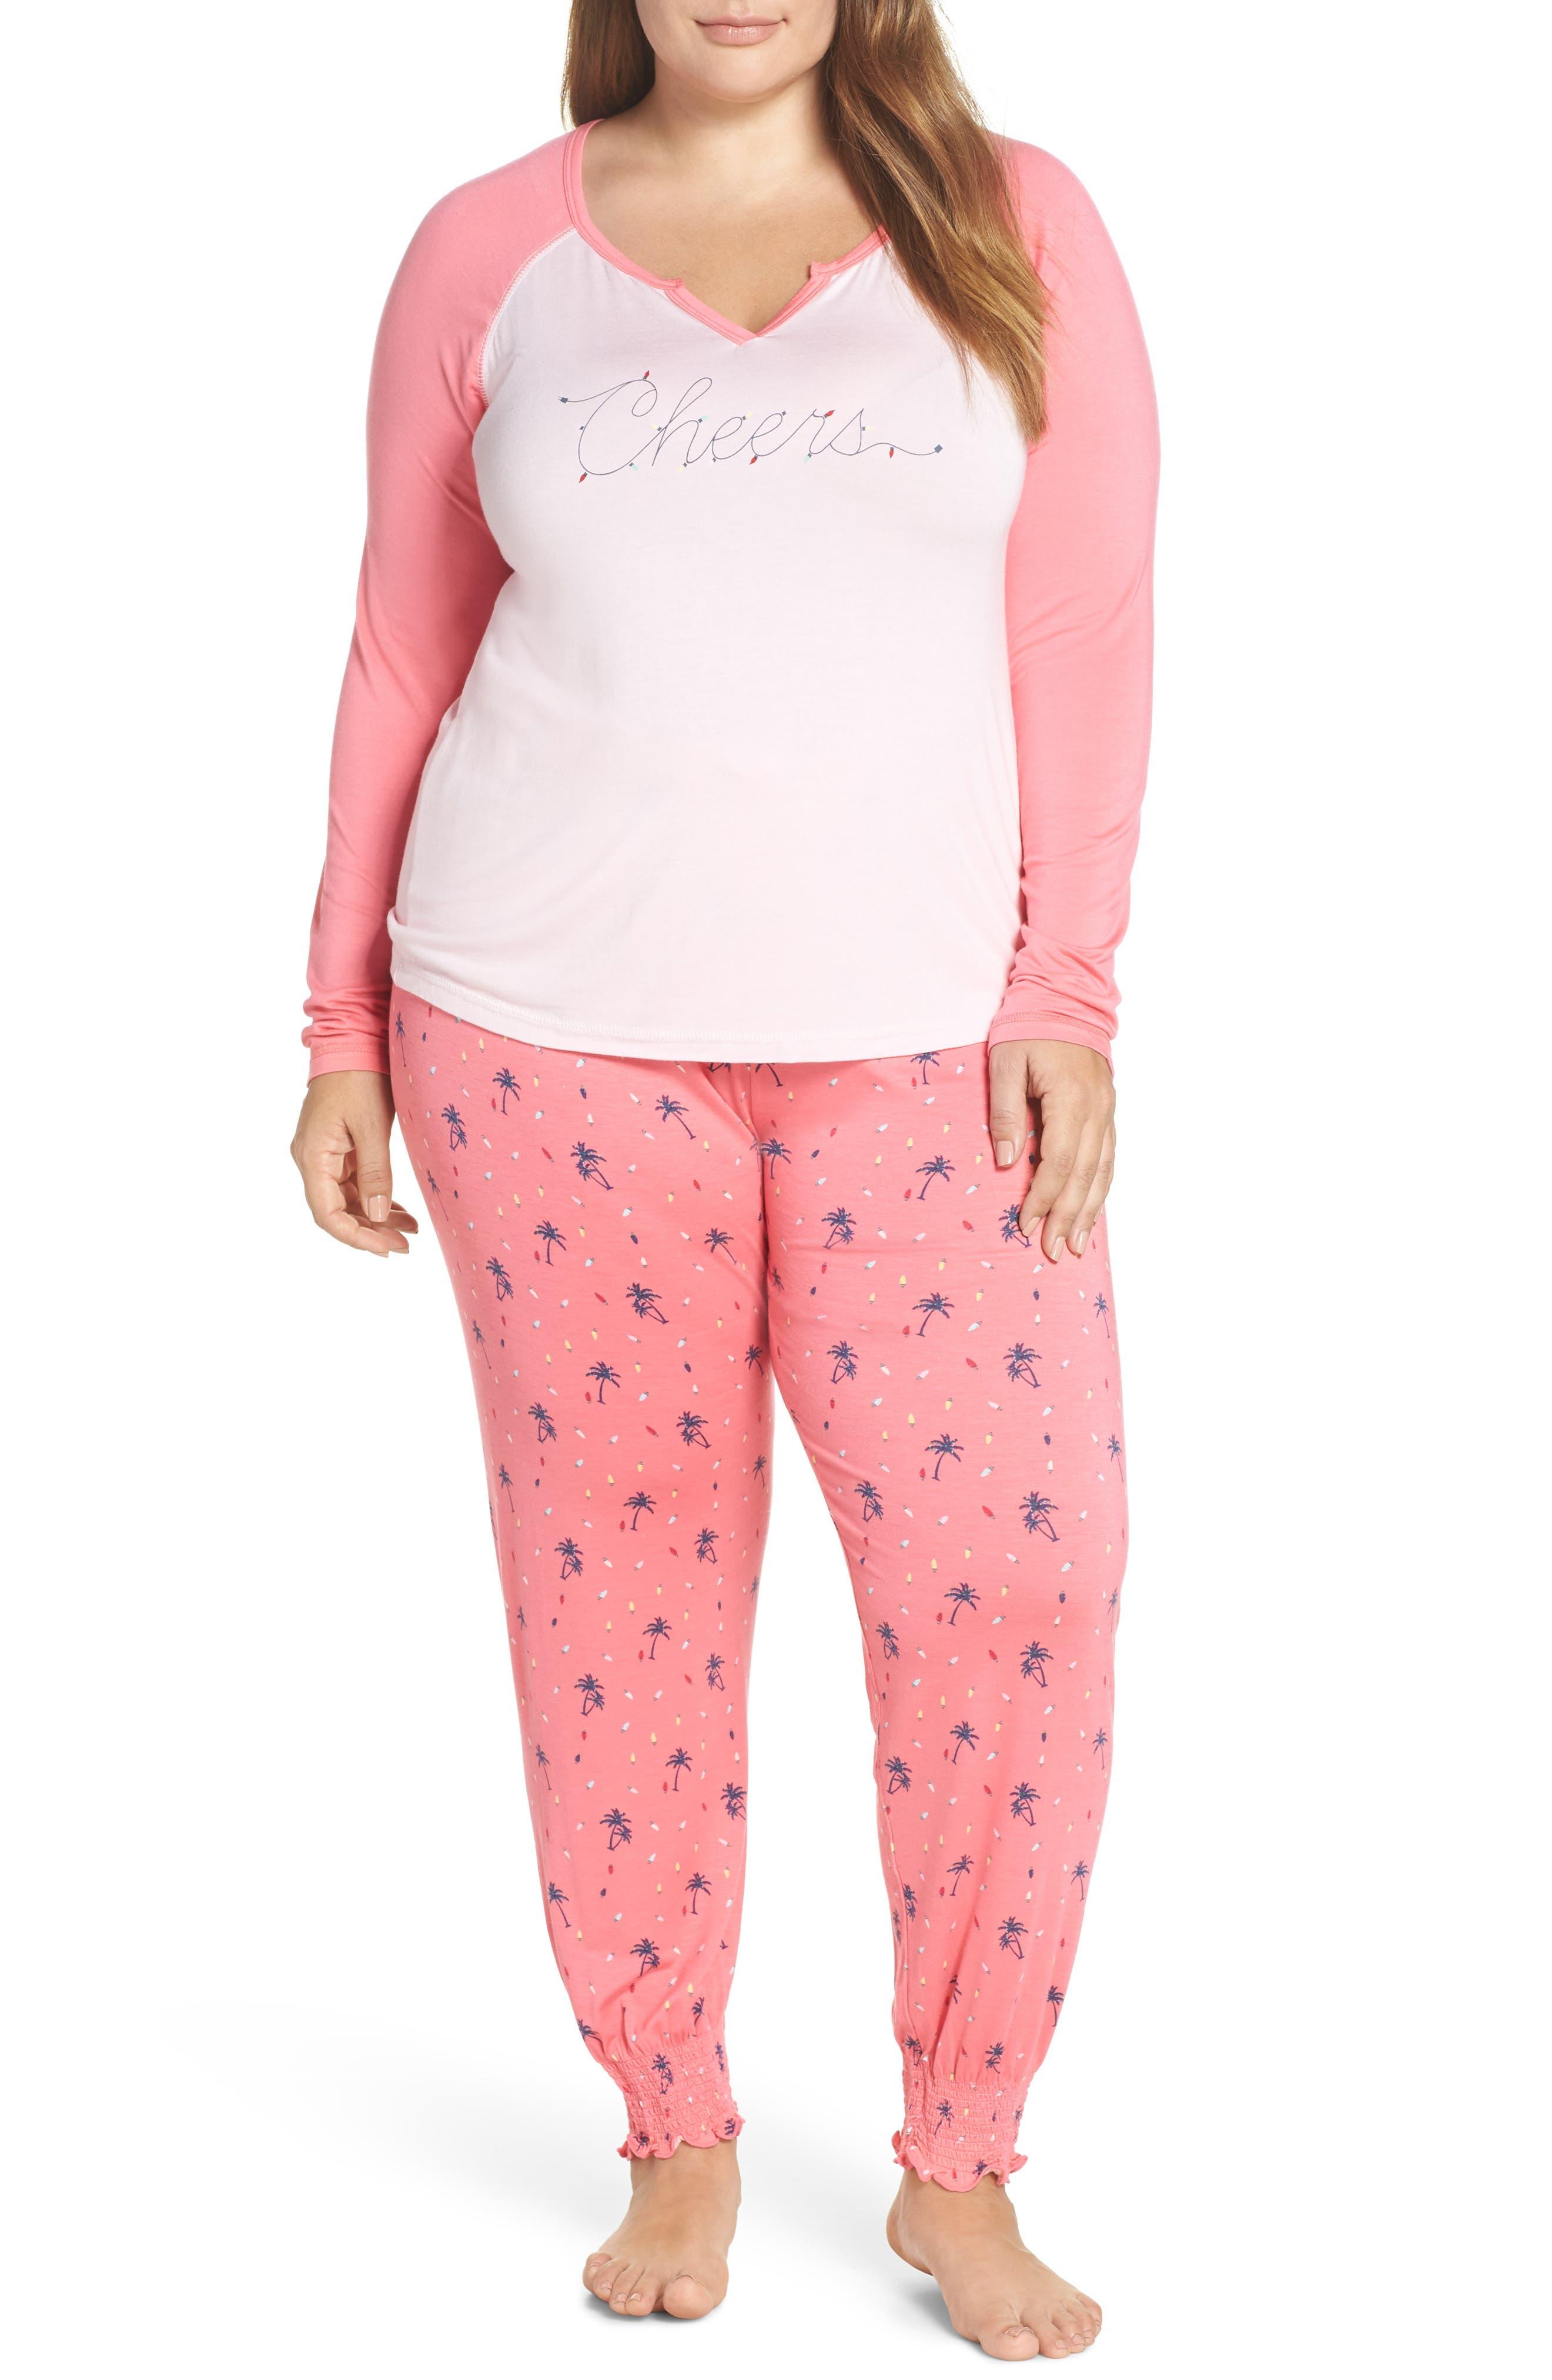 Plus Size Honeydew Intimates Winter Breaker Pajamas